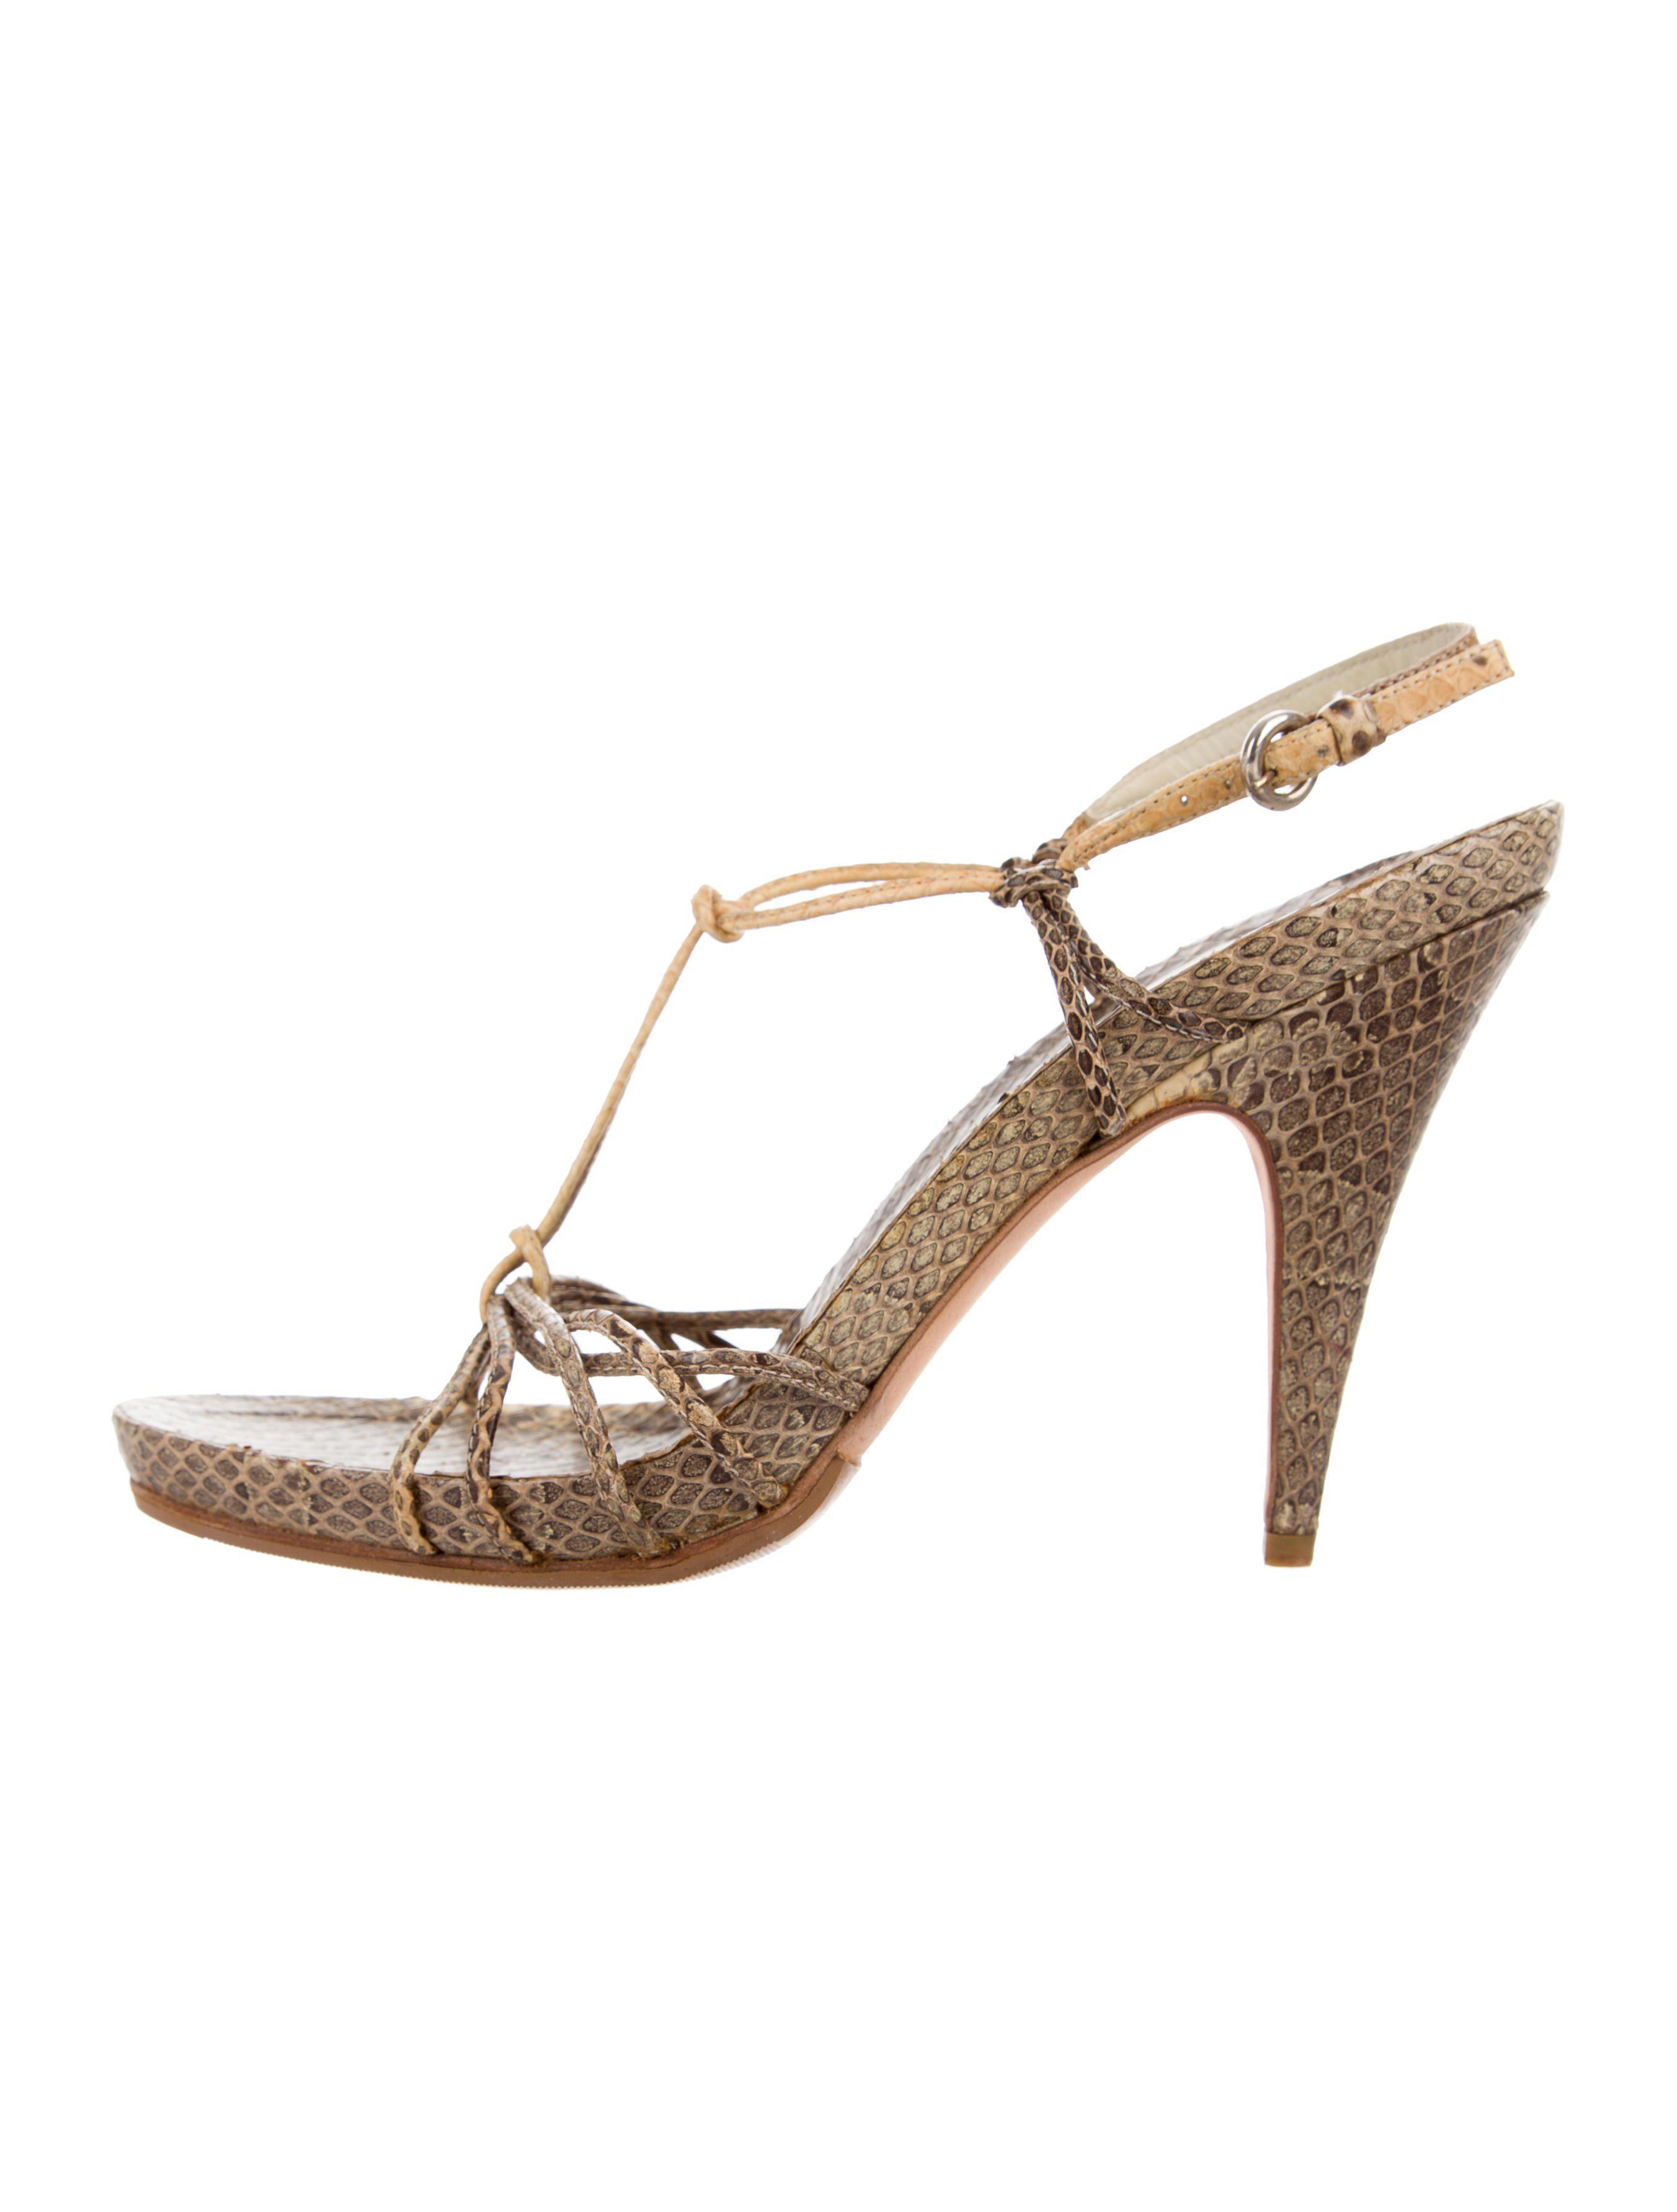 Miu Miu Snakeskin T-Strap Sandals for sale R5kBKID2A